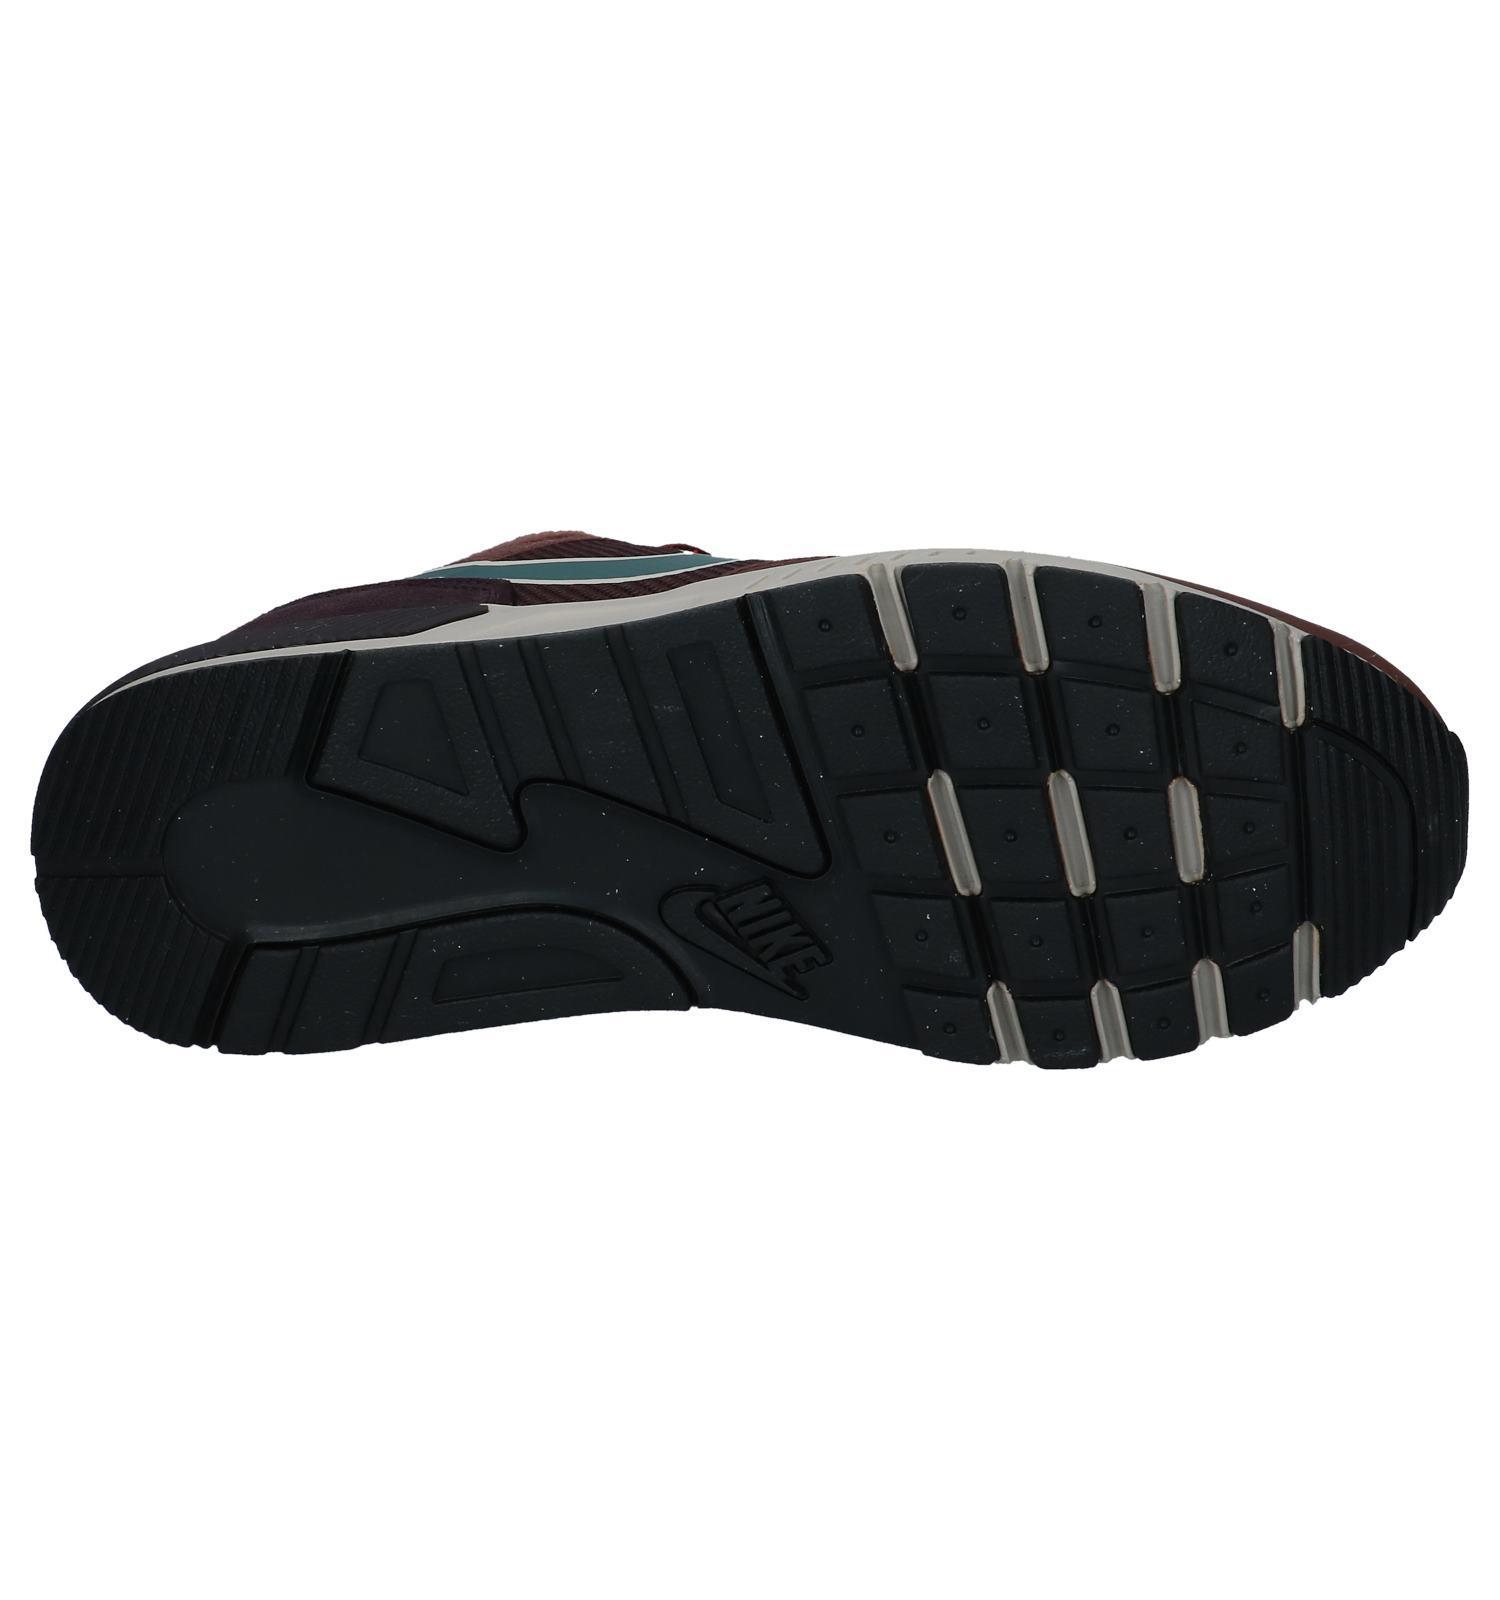 save off 09e03 6edbf Paarse Nike Nightgazer Trail Lage Sneakers   TORFS.BE   Gratis verzend en  retour